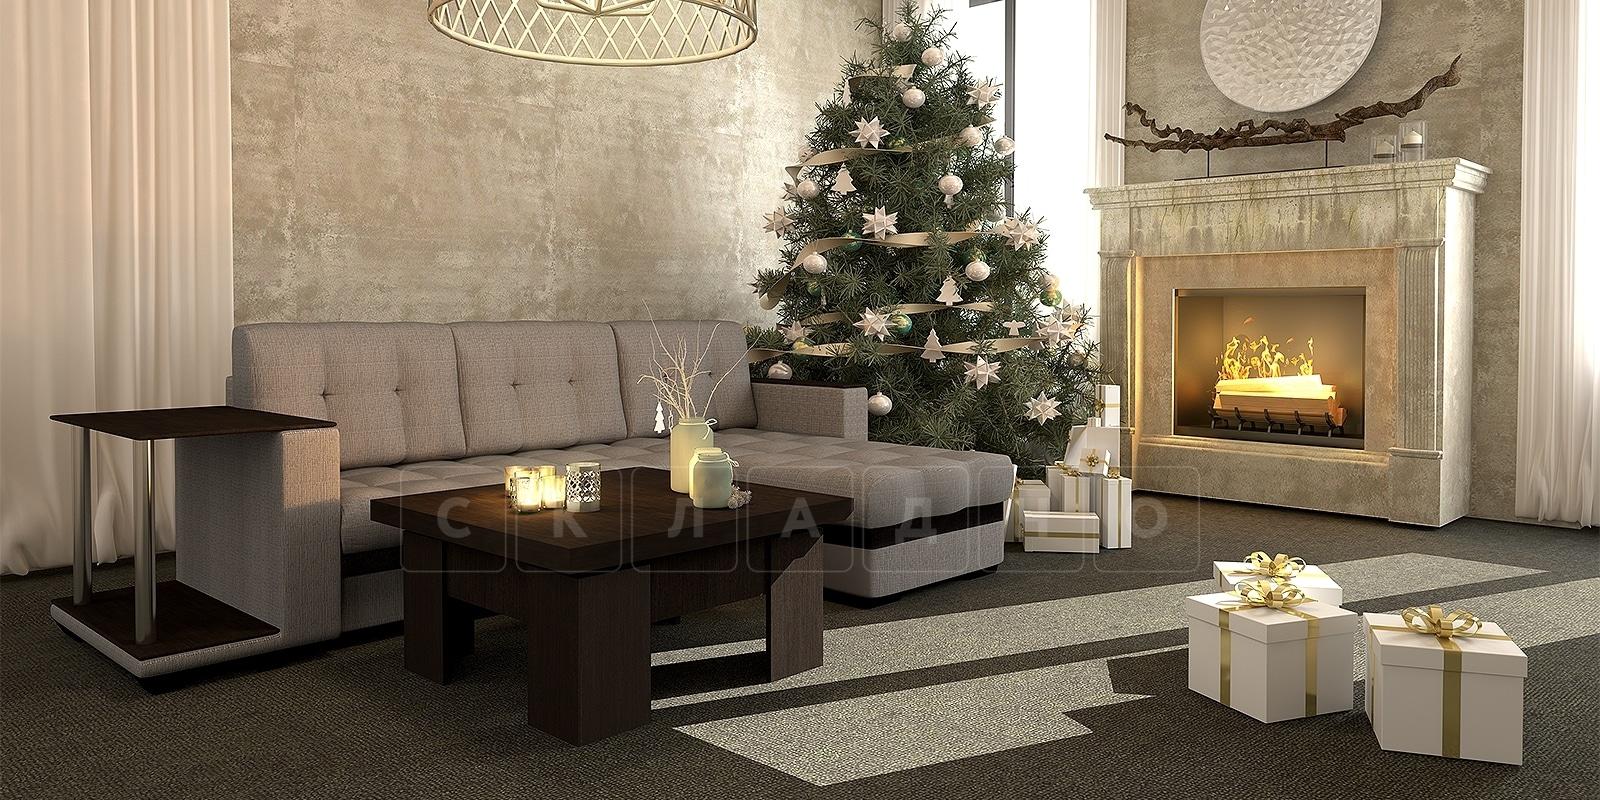 Угловой диван Атланта рогожка темно-бежевого цвета фото 11 | интернет-магазин Складно